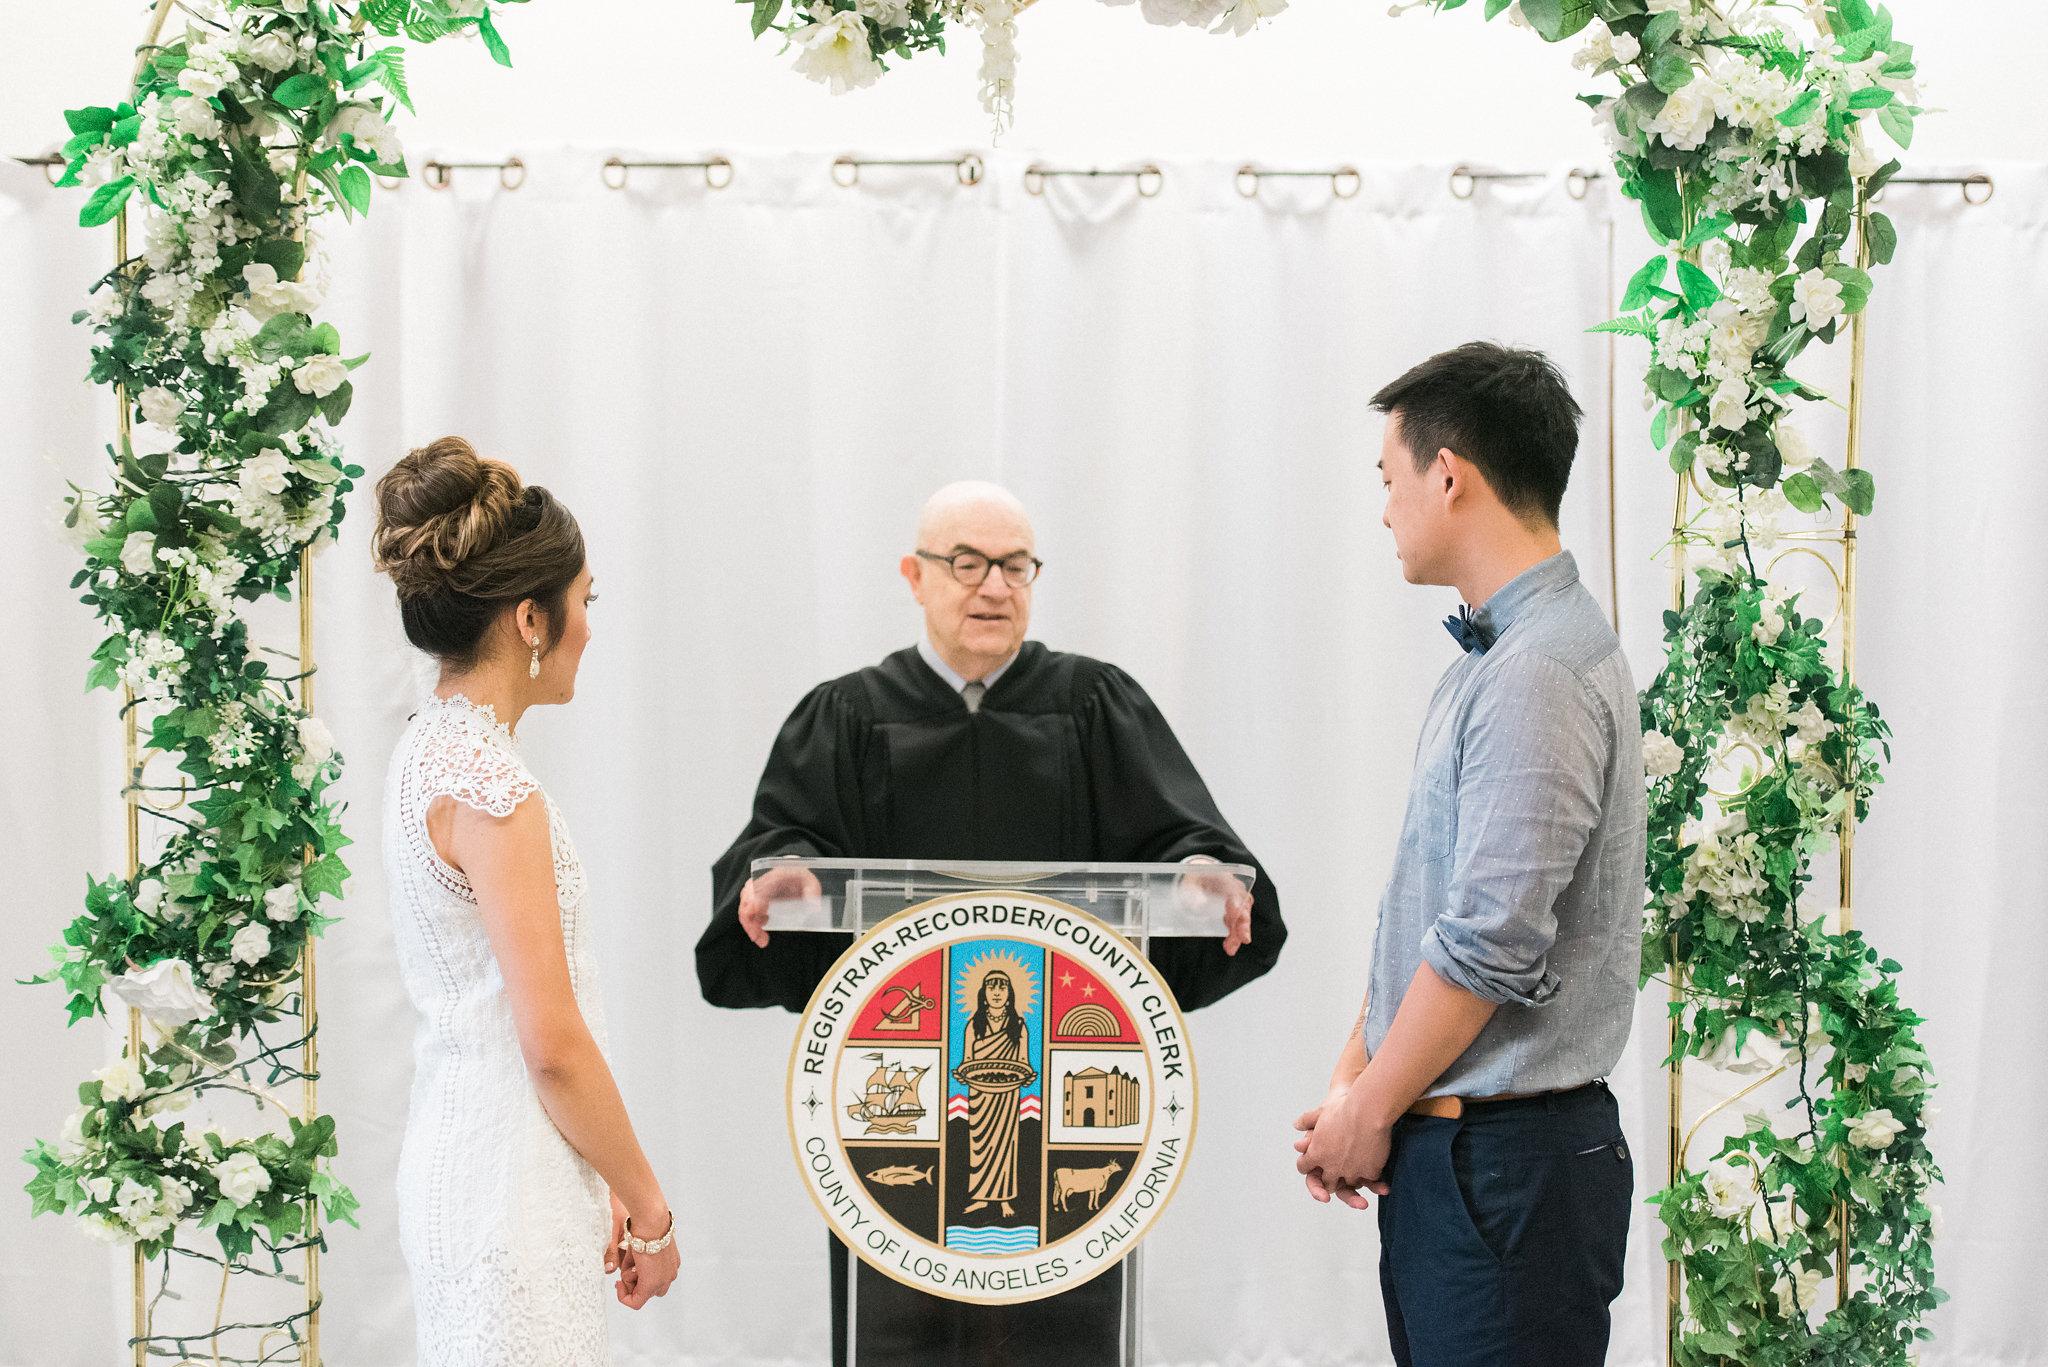 Beginning the ceremony